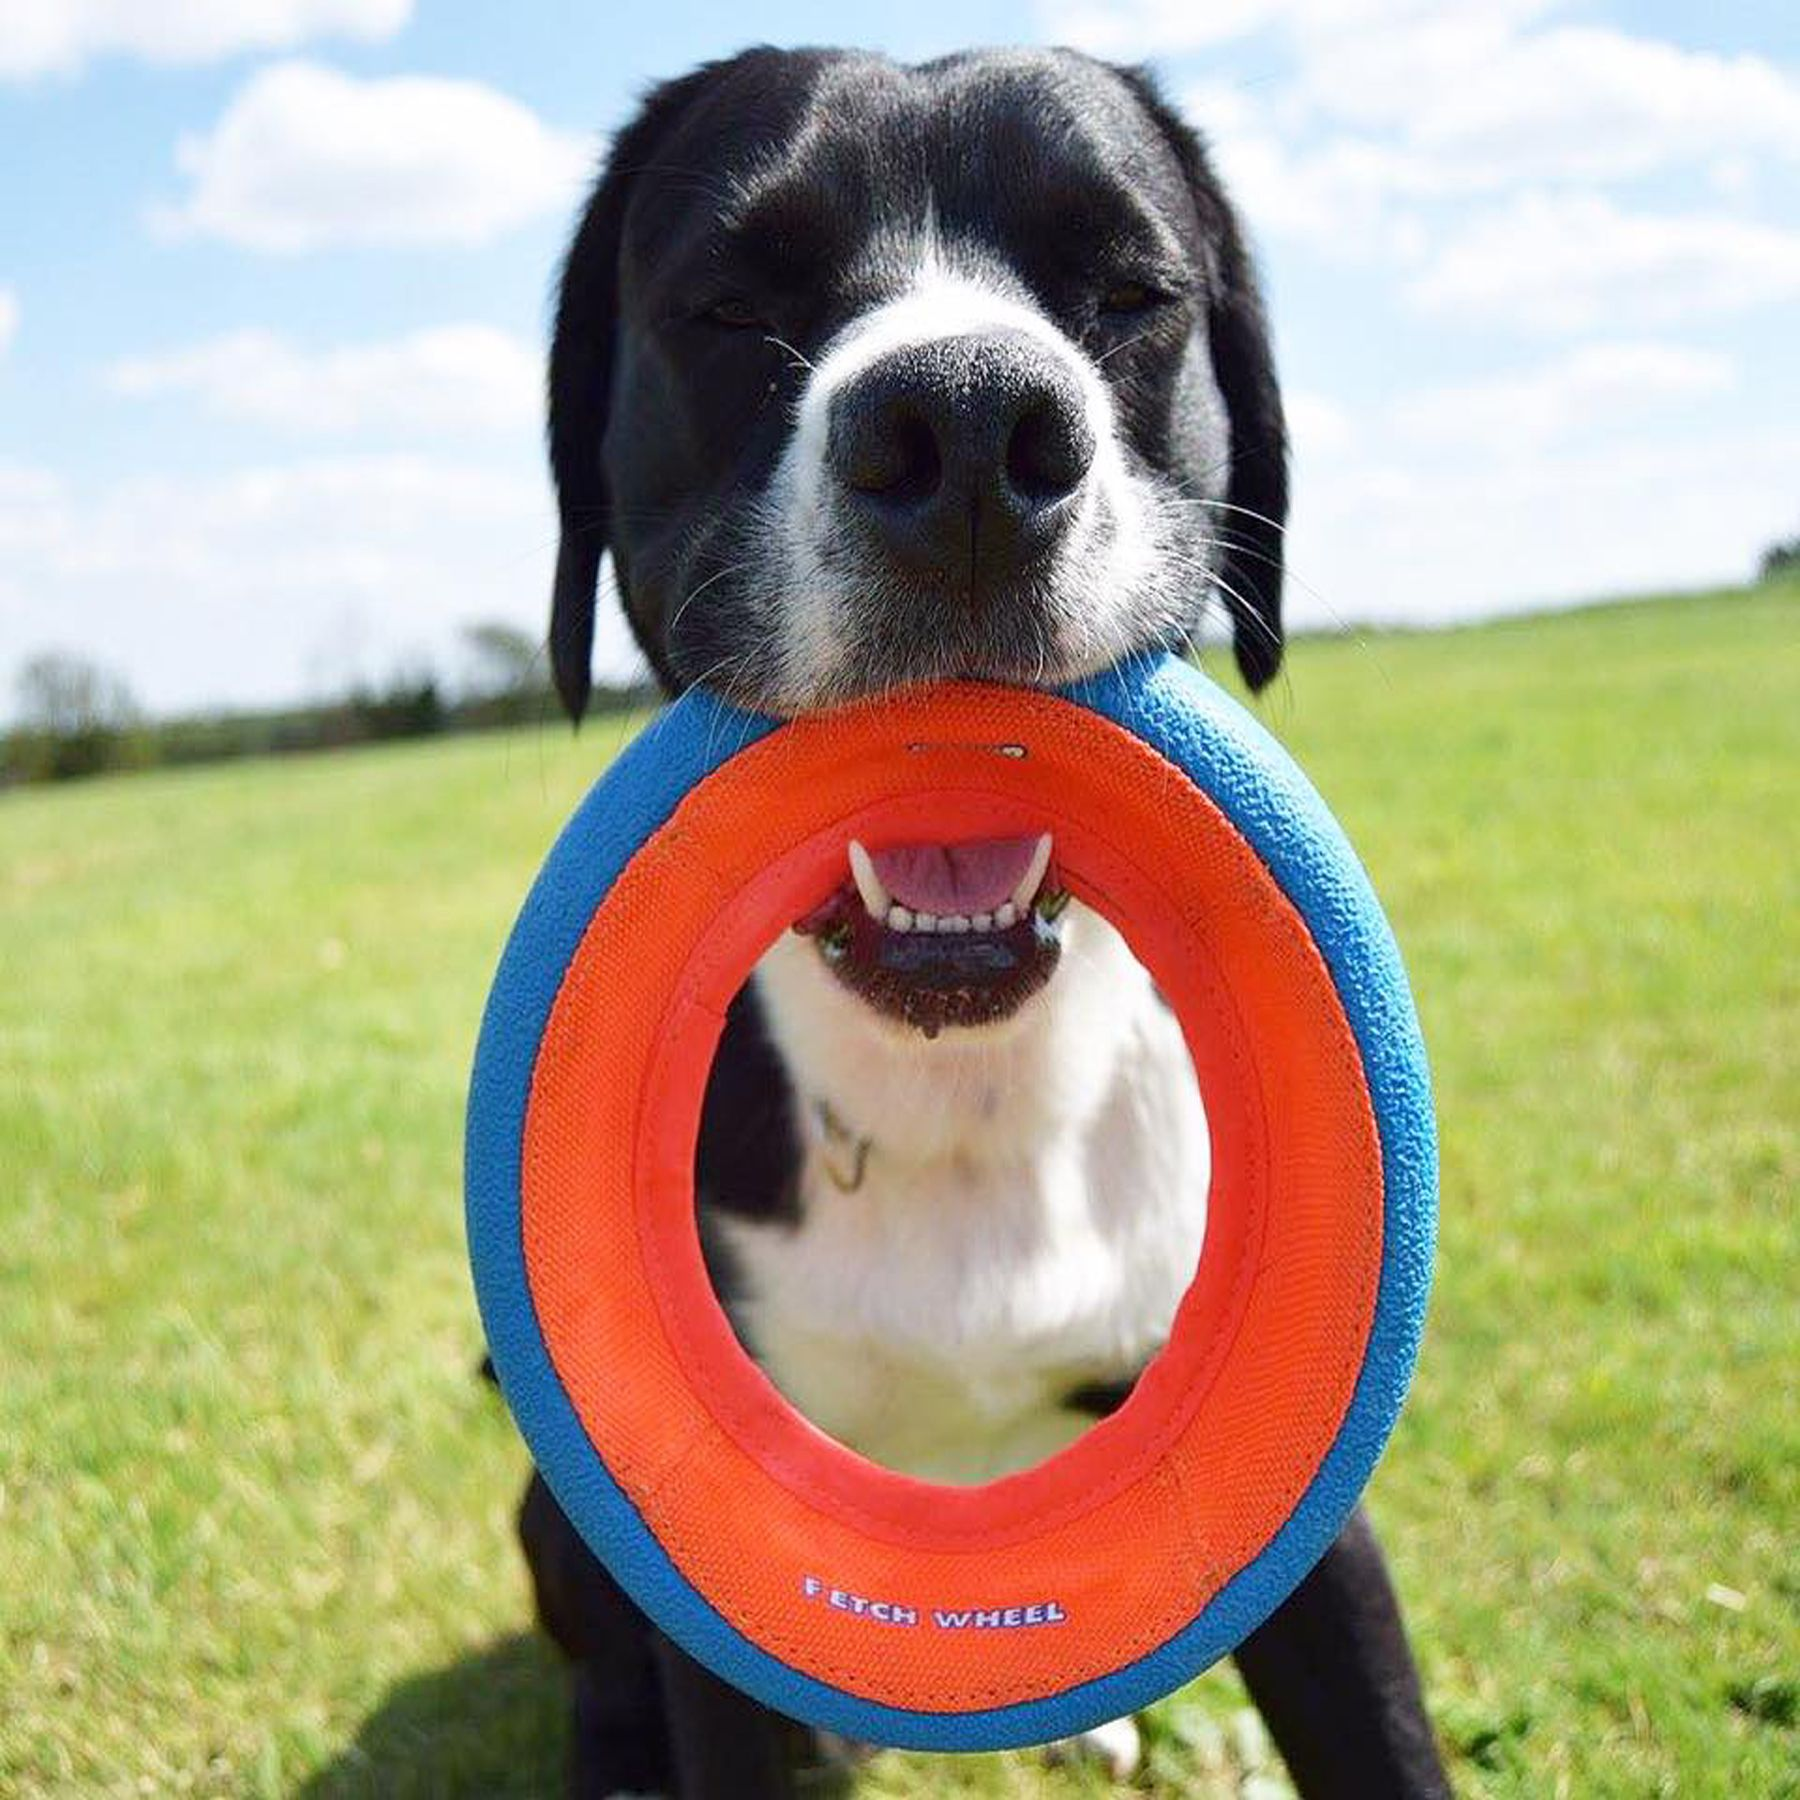 Fetchit Fetch Wheel Dog Toy Dog Toys Dogs Fetch Toy